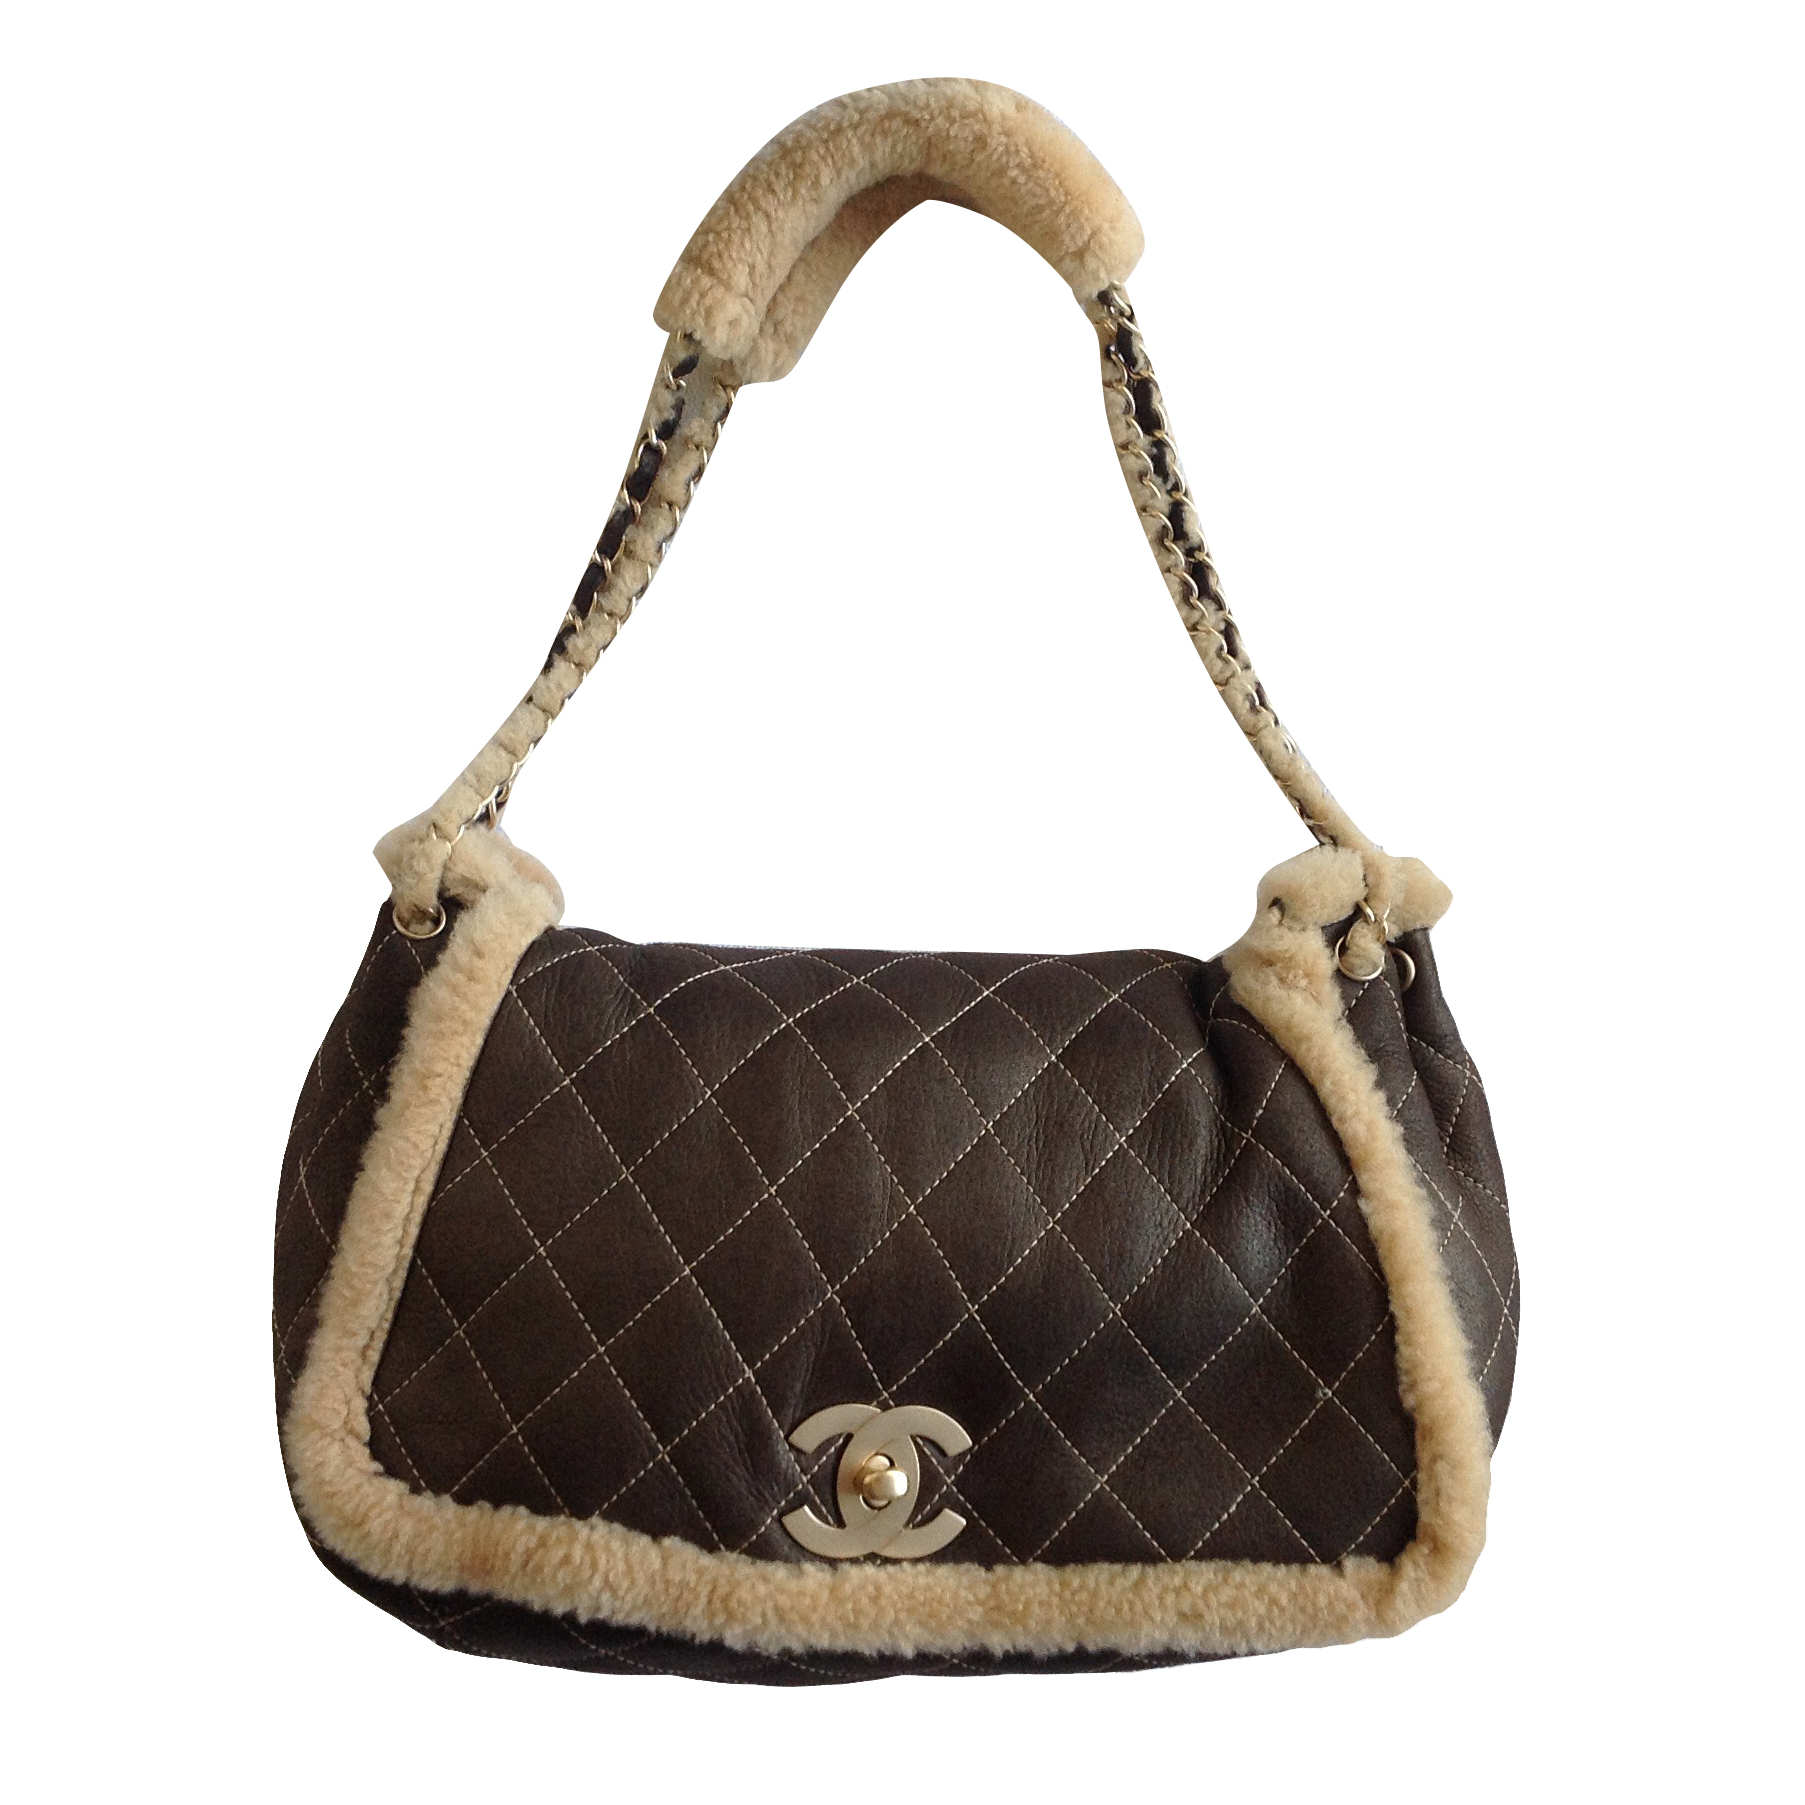 b4ad1b6e781b7d Chanel Shearling Flap Bag | HEWI London